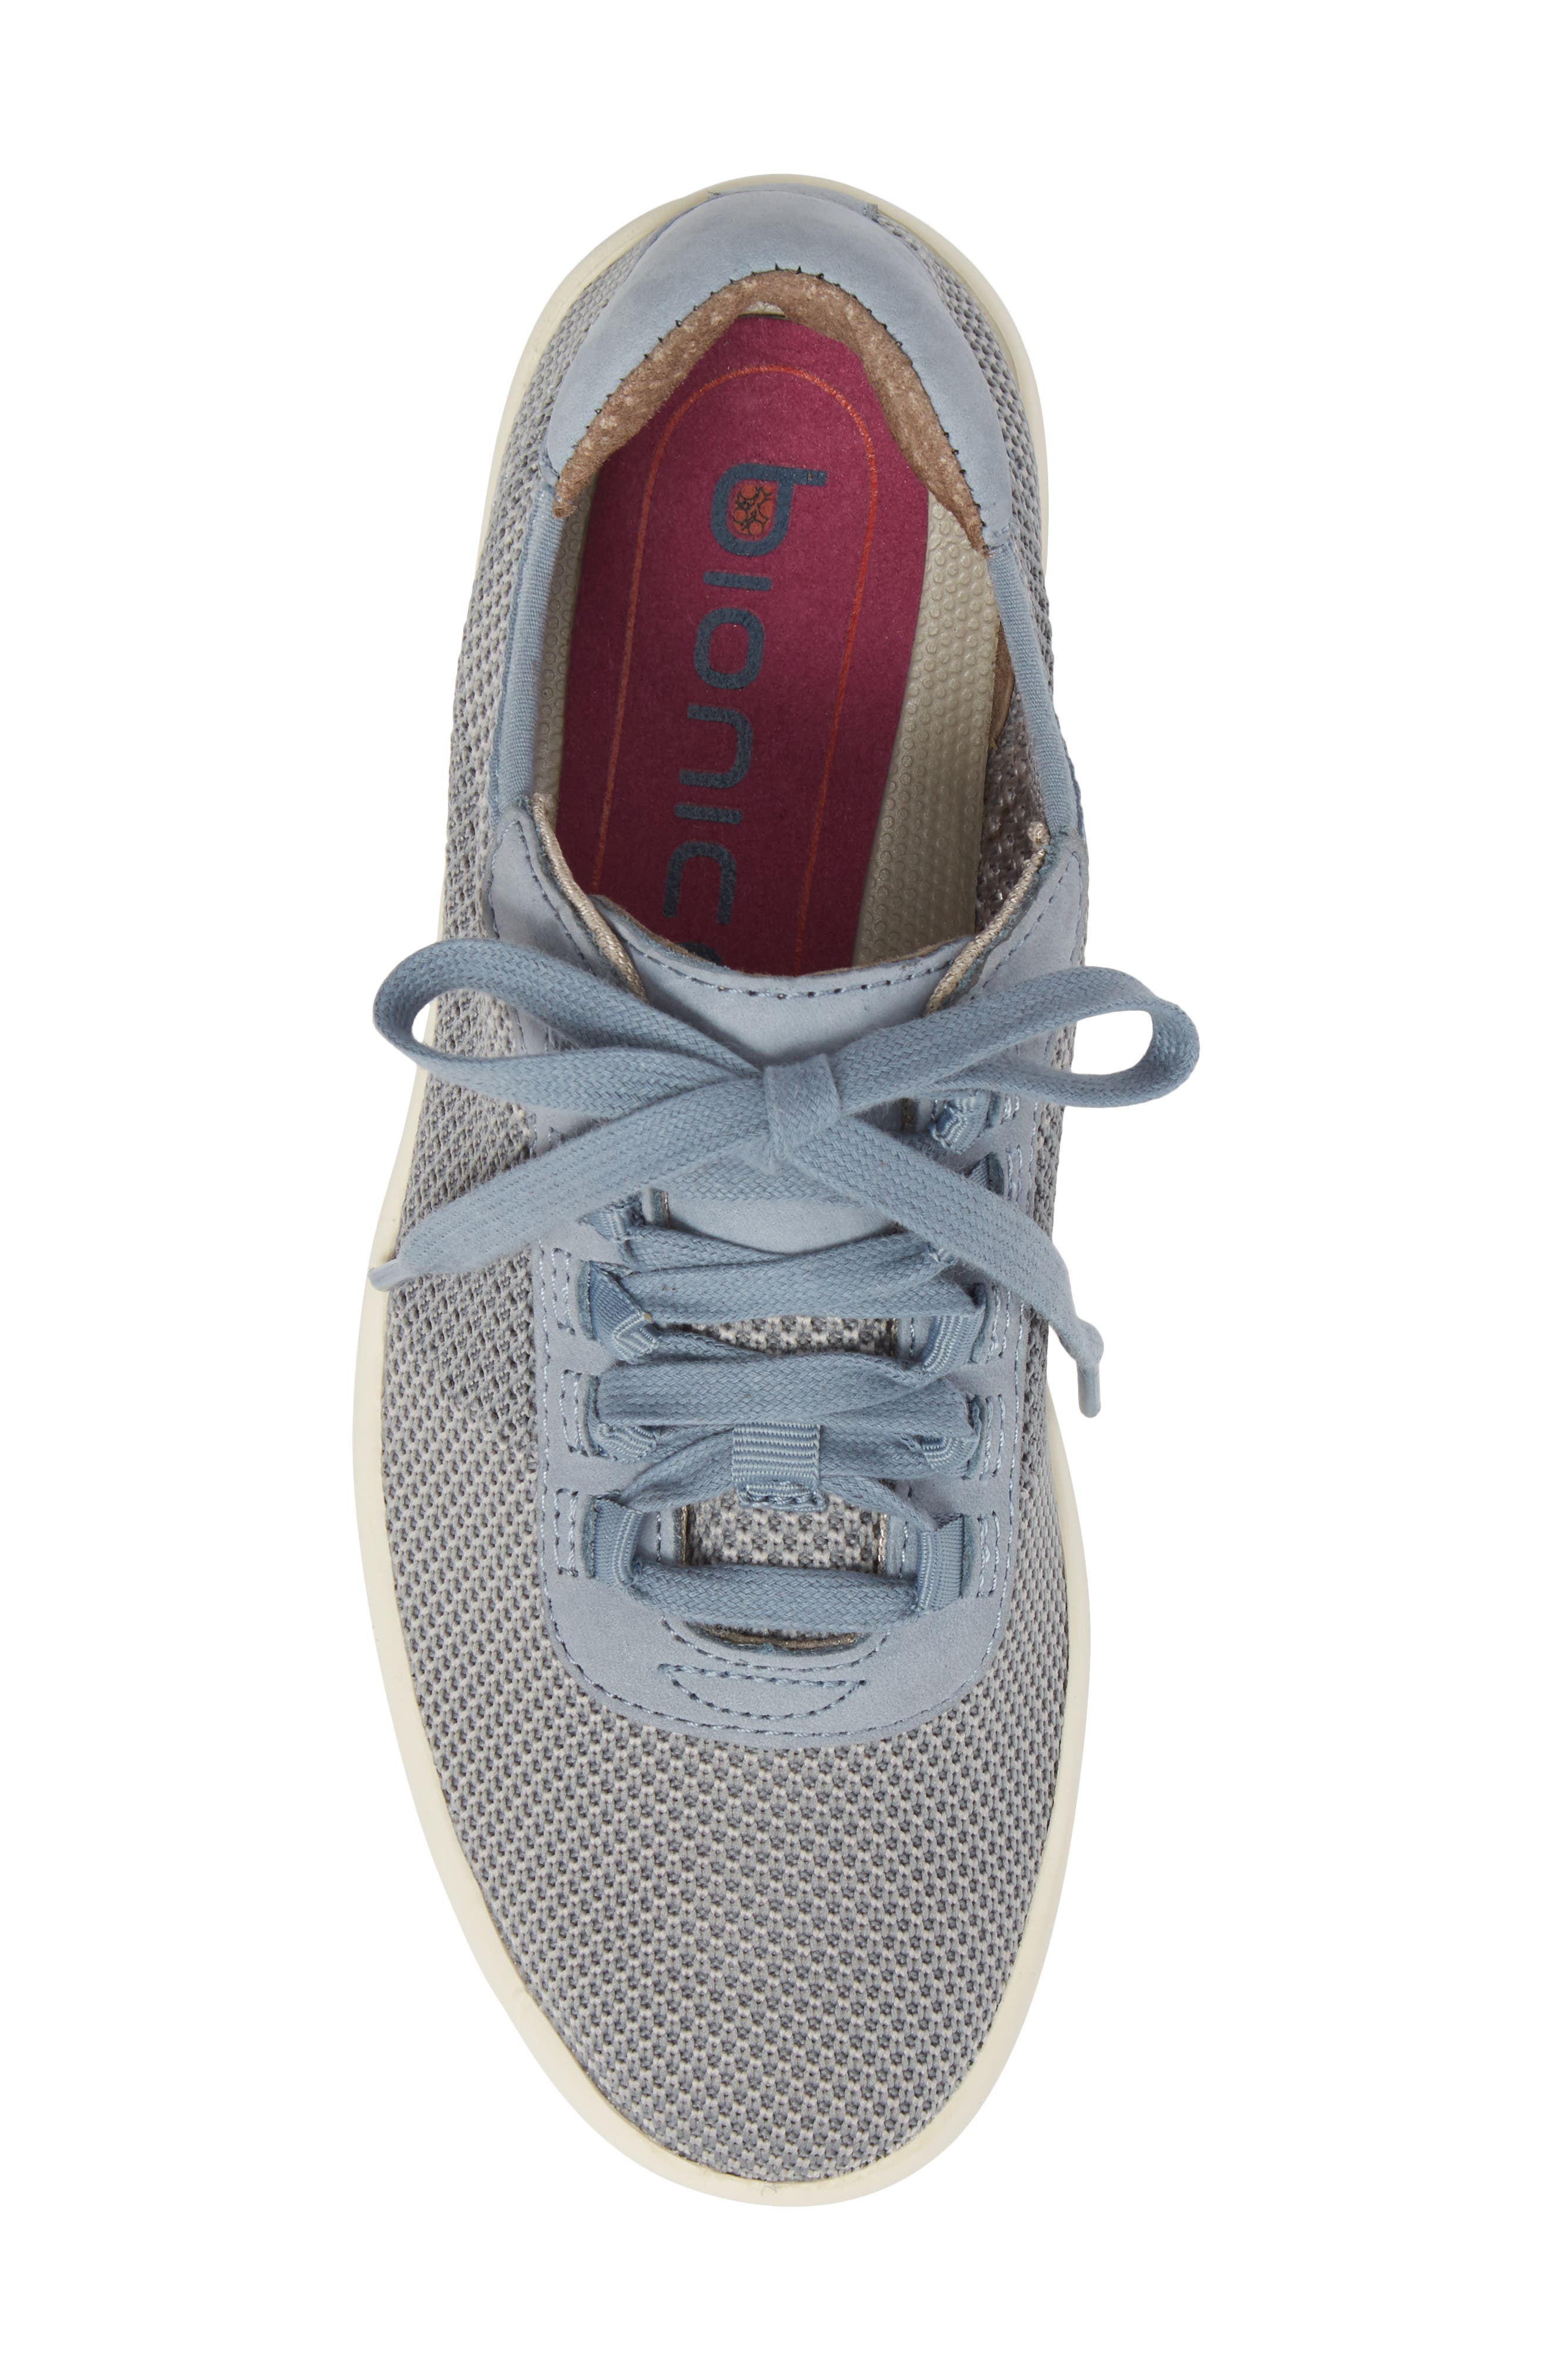 Malibu Sneaker,                             Alternate thumbnail 5, color,                             Chambray Grey Knit Fabric